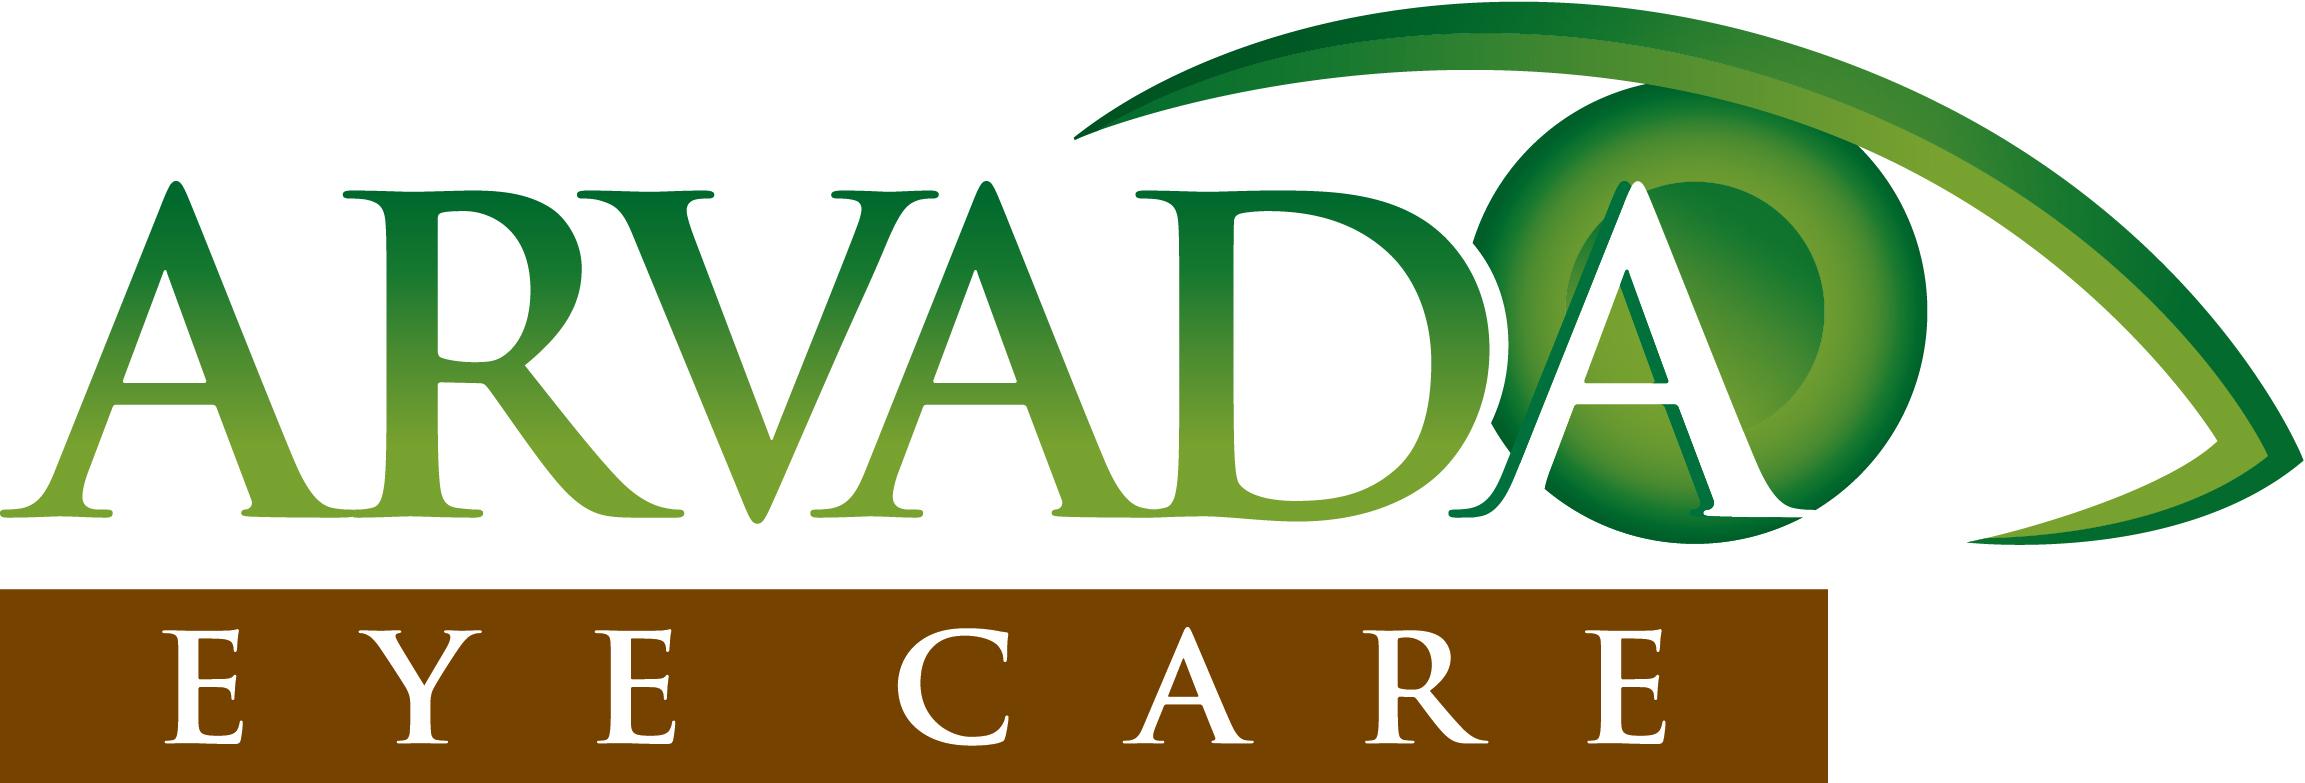 Arvada Eye Care Logo